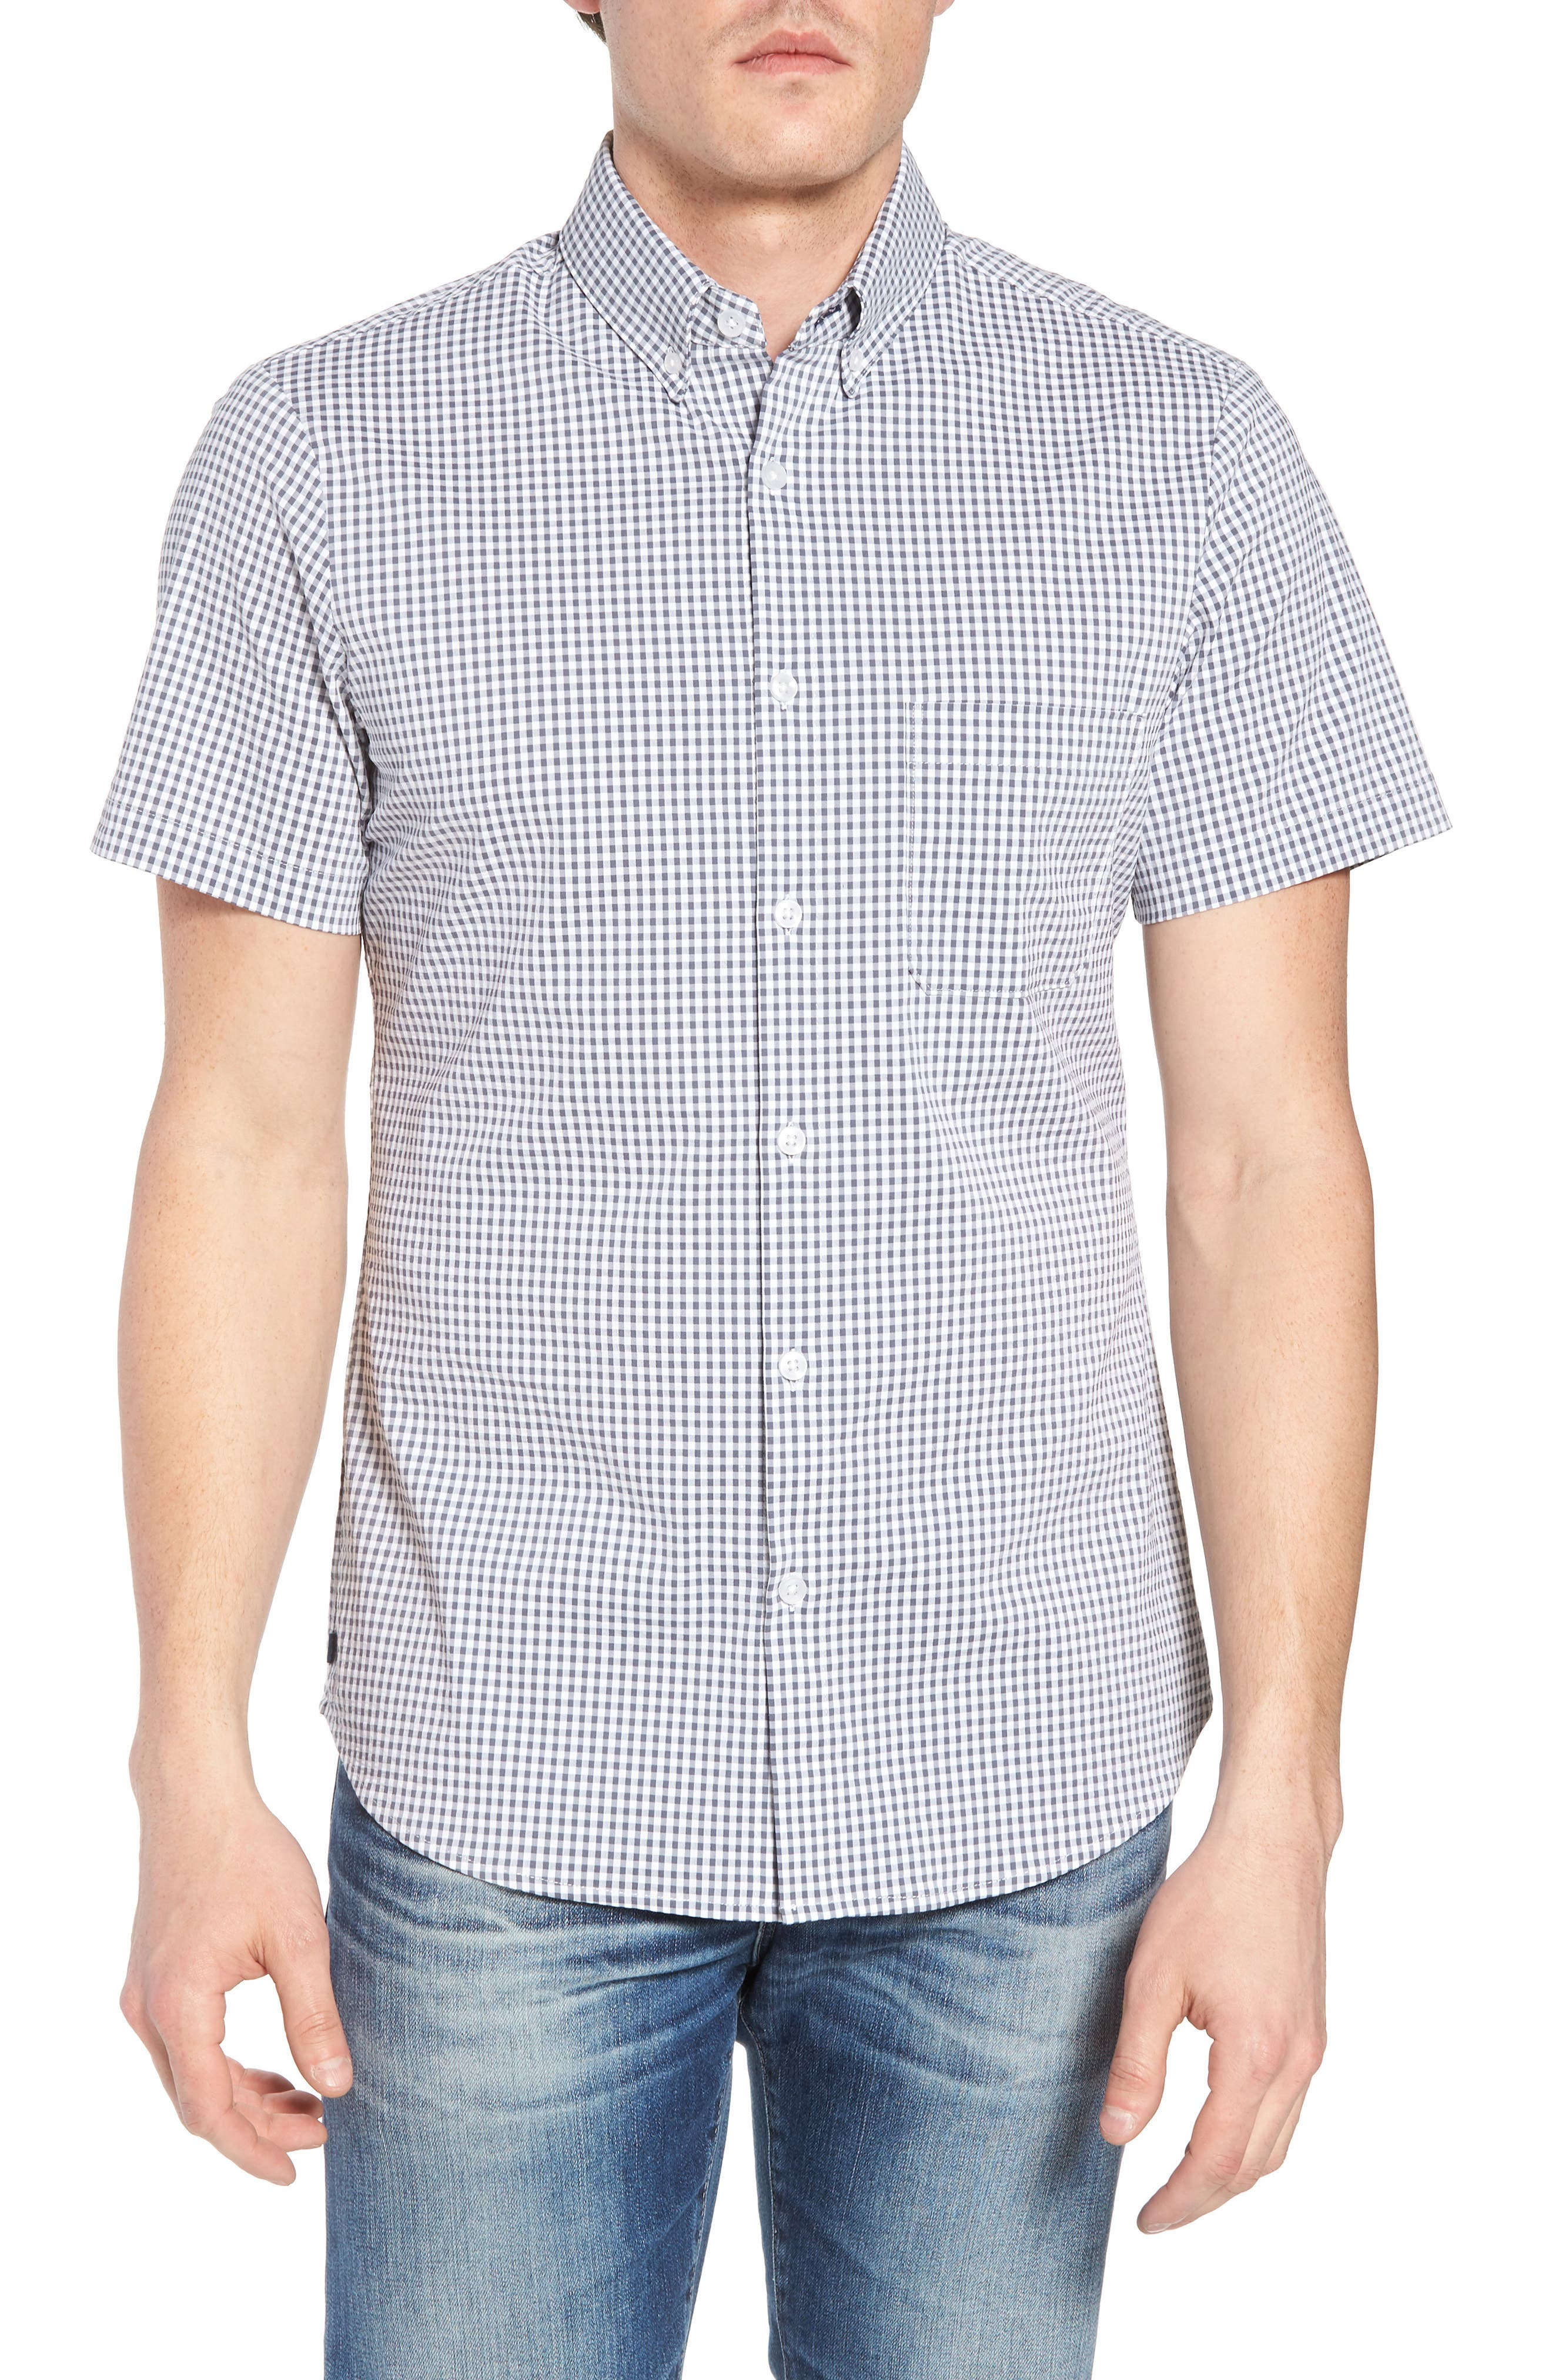 Harrison Seersucker Check Performance Sport Shirt,                         Main,                         color, NAVY